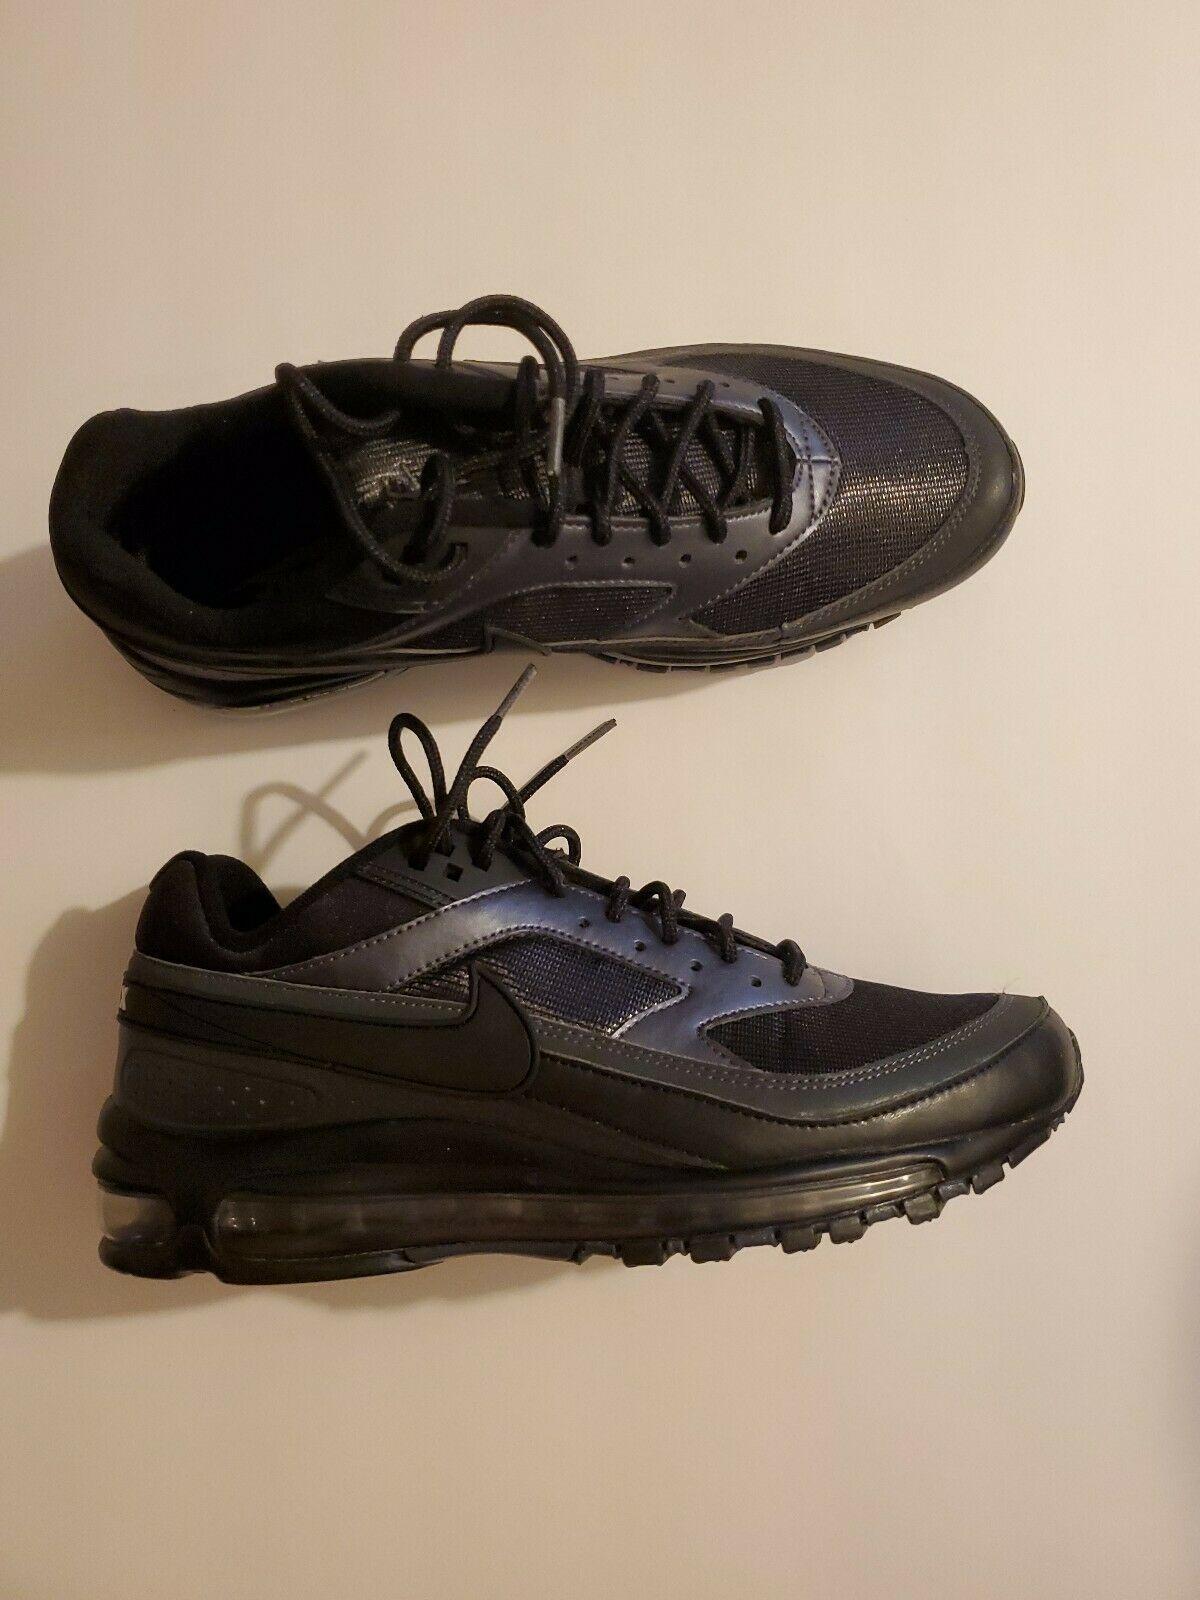 Nike Air Max 97/BW Running Shoes Black Metallic Hematite Men's Sz 7 AO2406-001 image 2